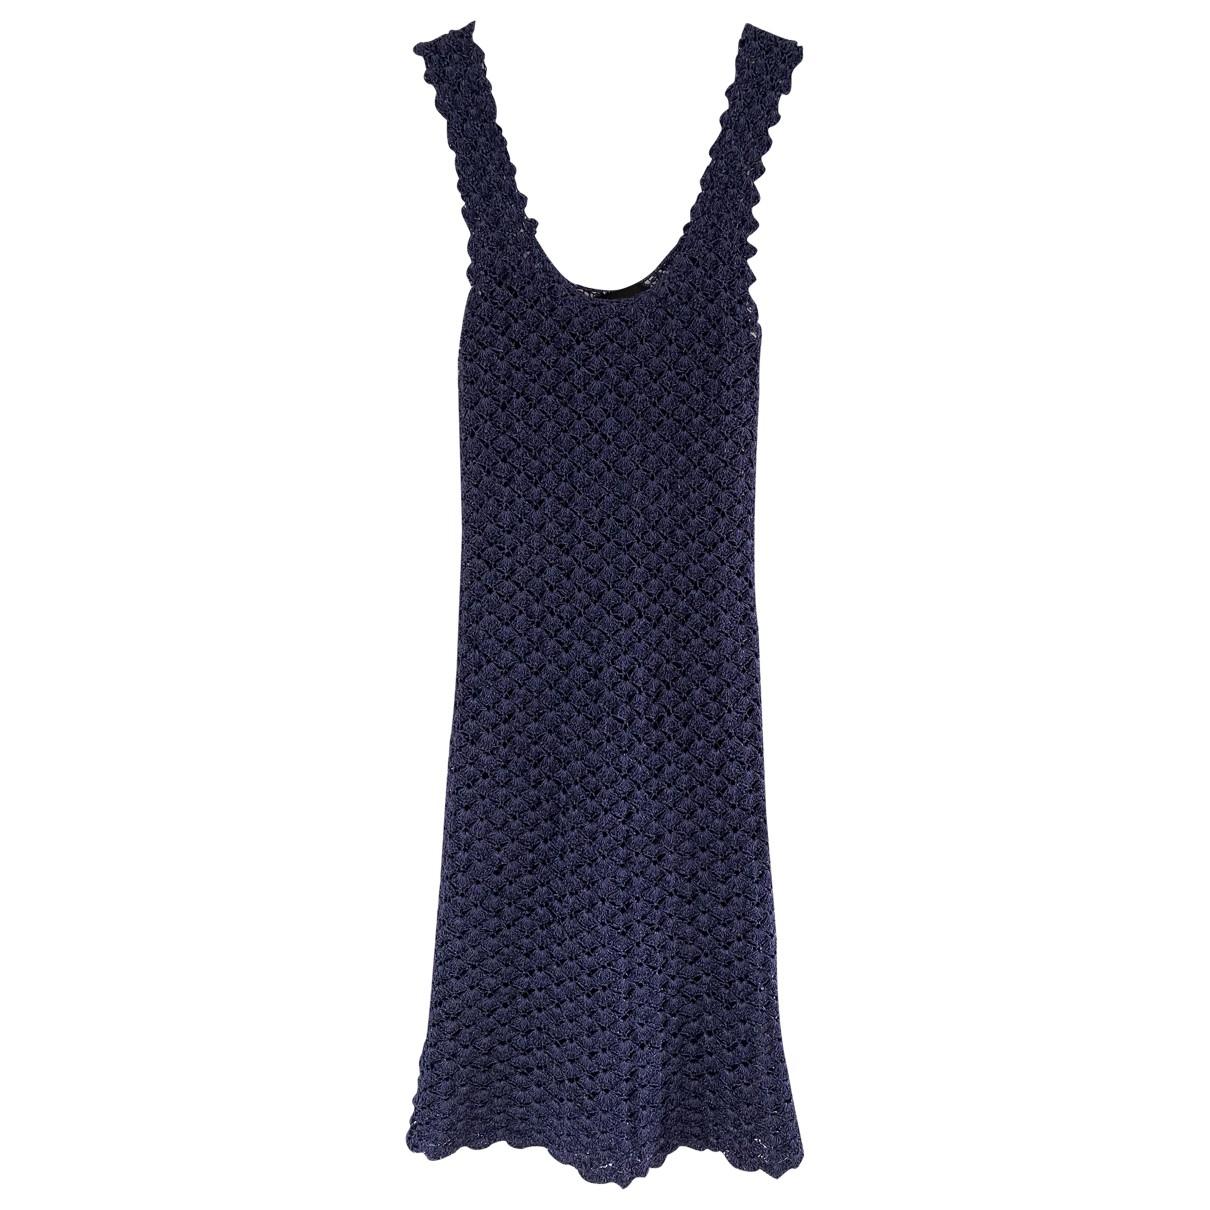 Emporio Armani \N Blue dress for Women 38 IT